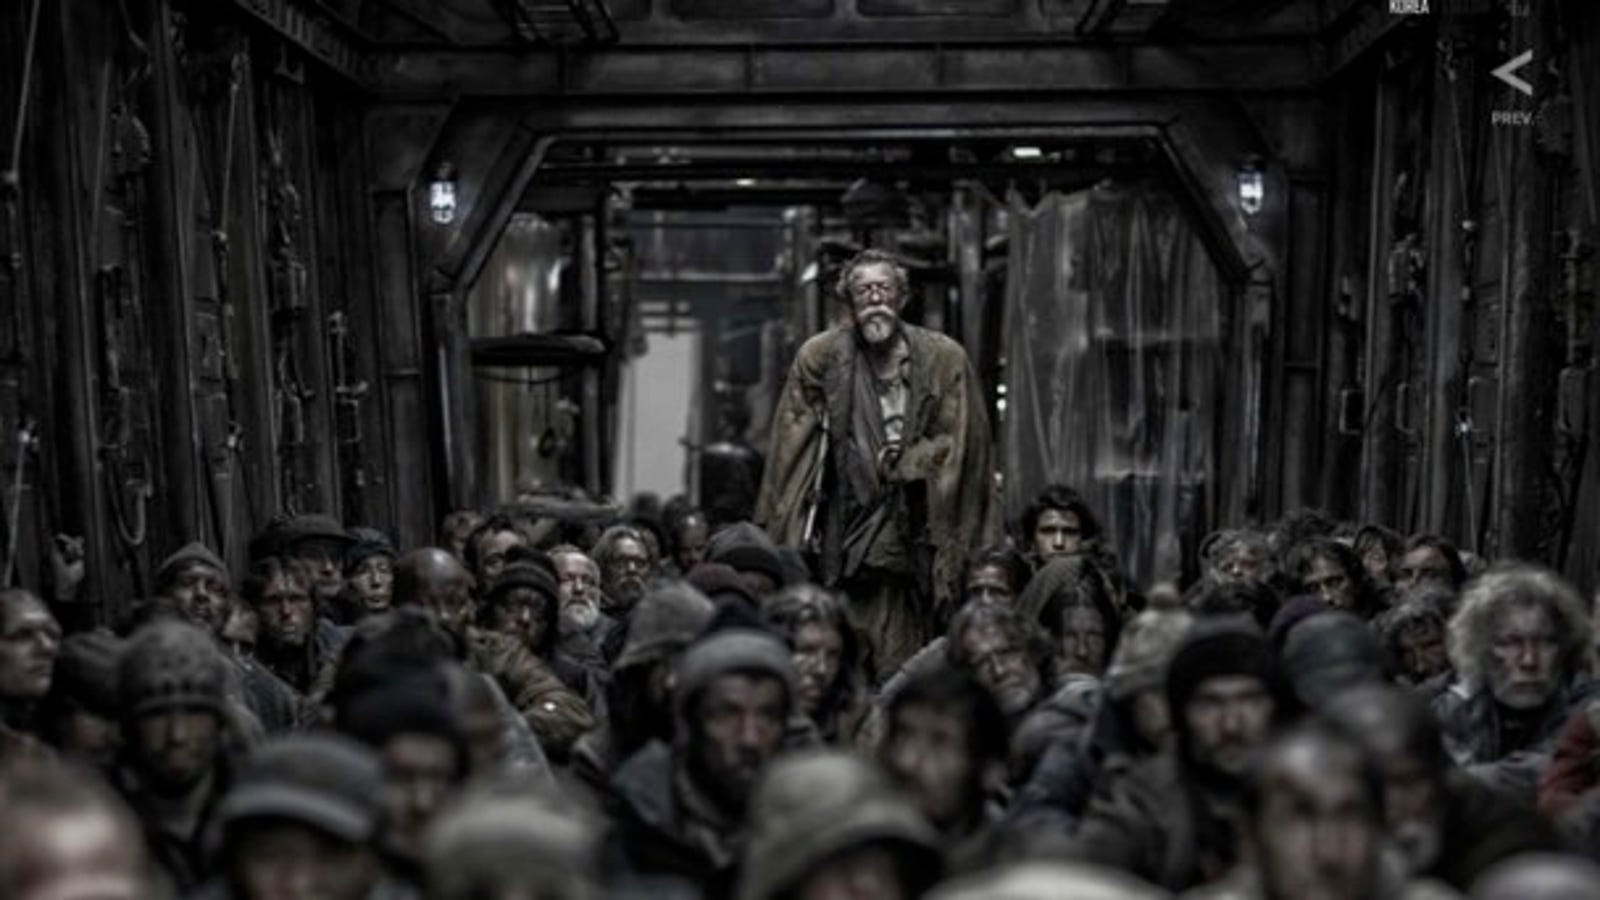 John Hurt's 8 Most Memorable Scifi and Fantasy Movie Roles